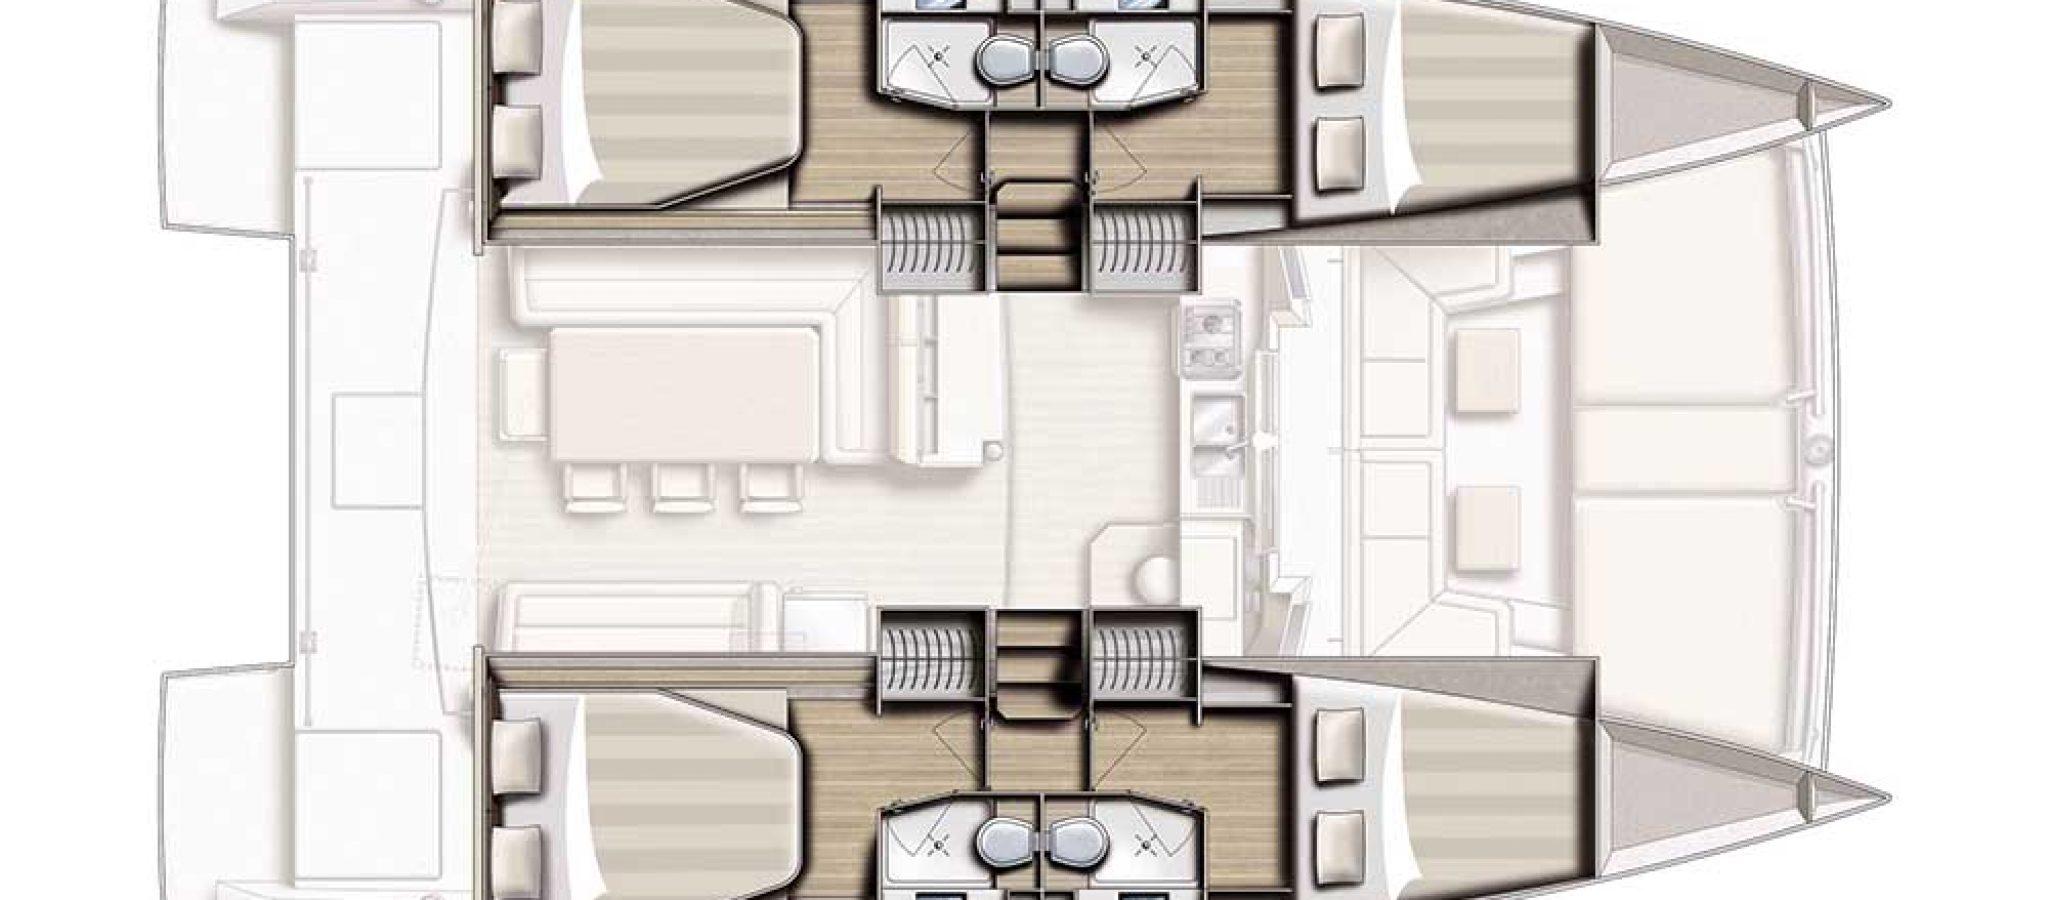 Bali 4.0 plan 4 cabines